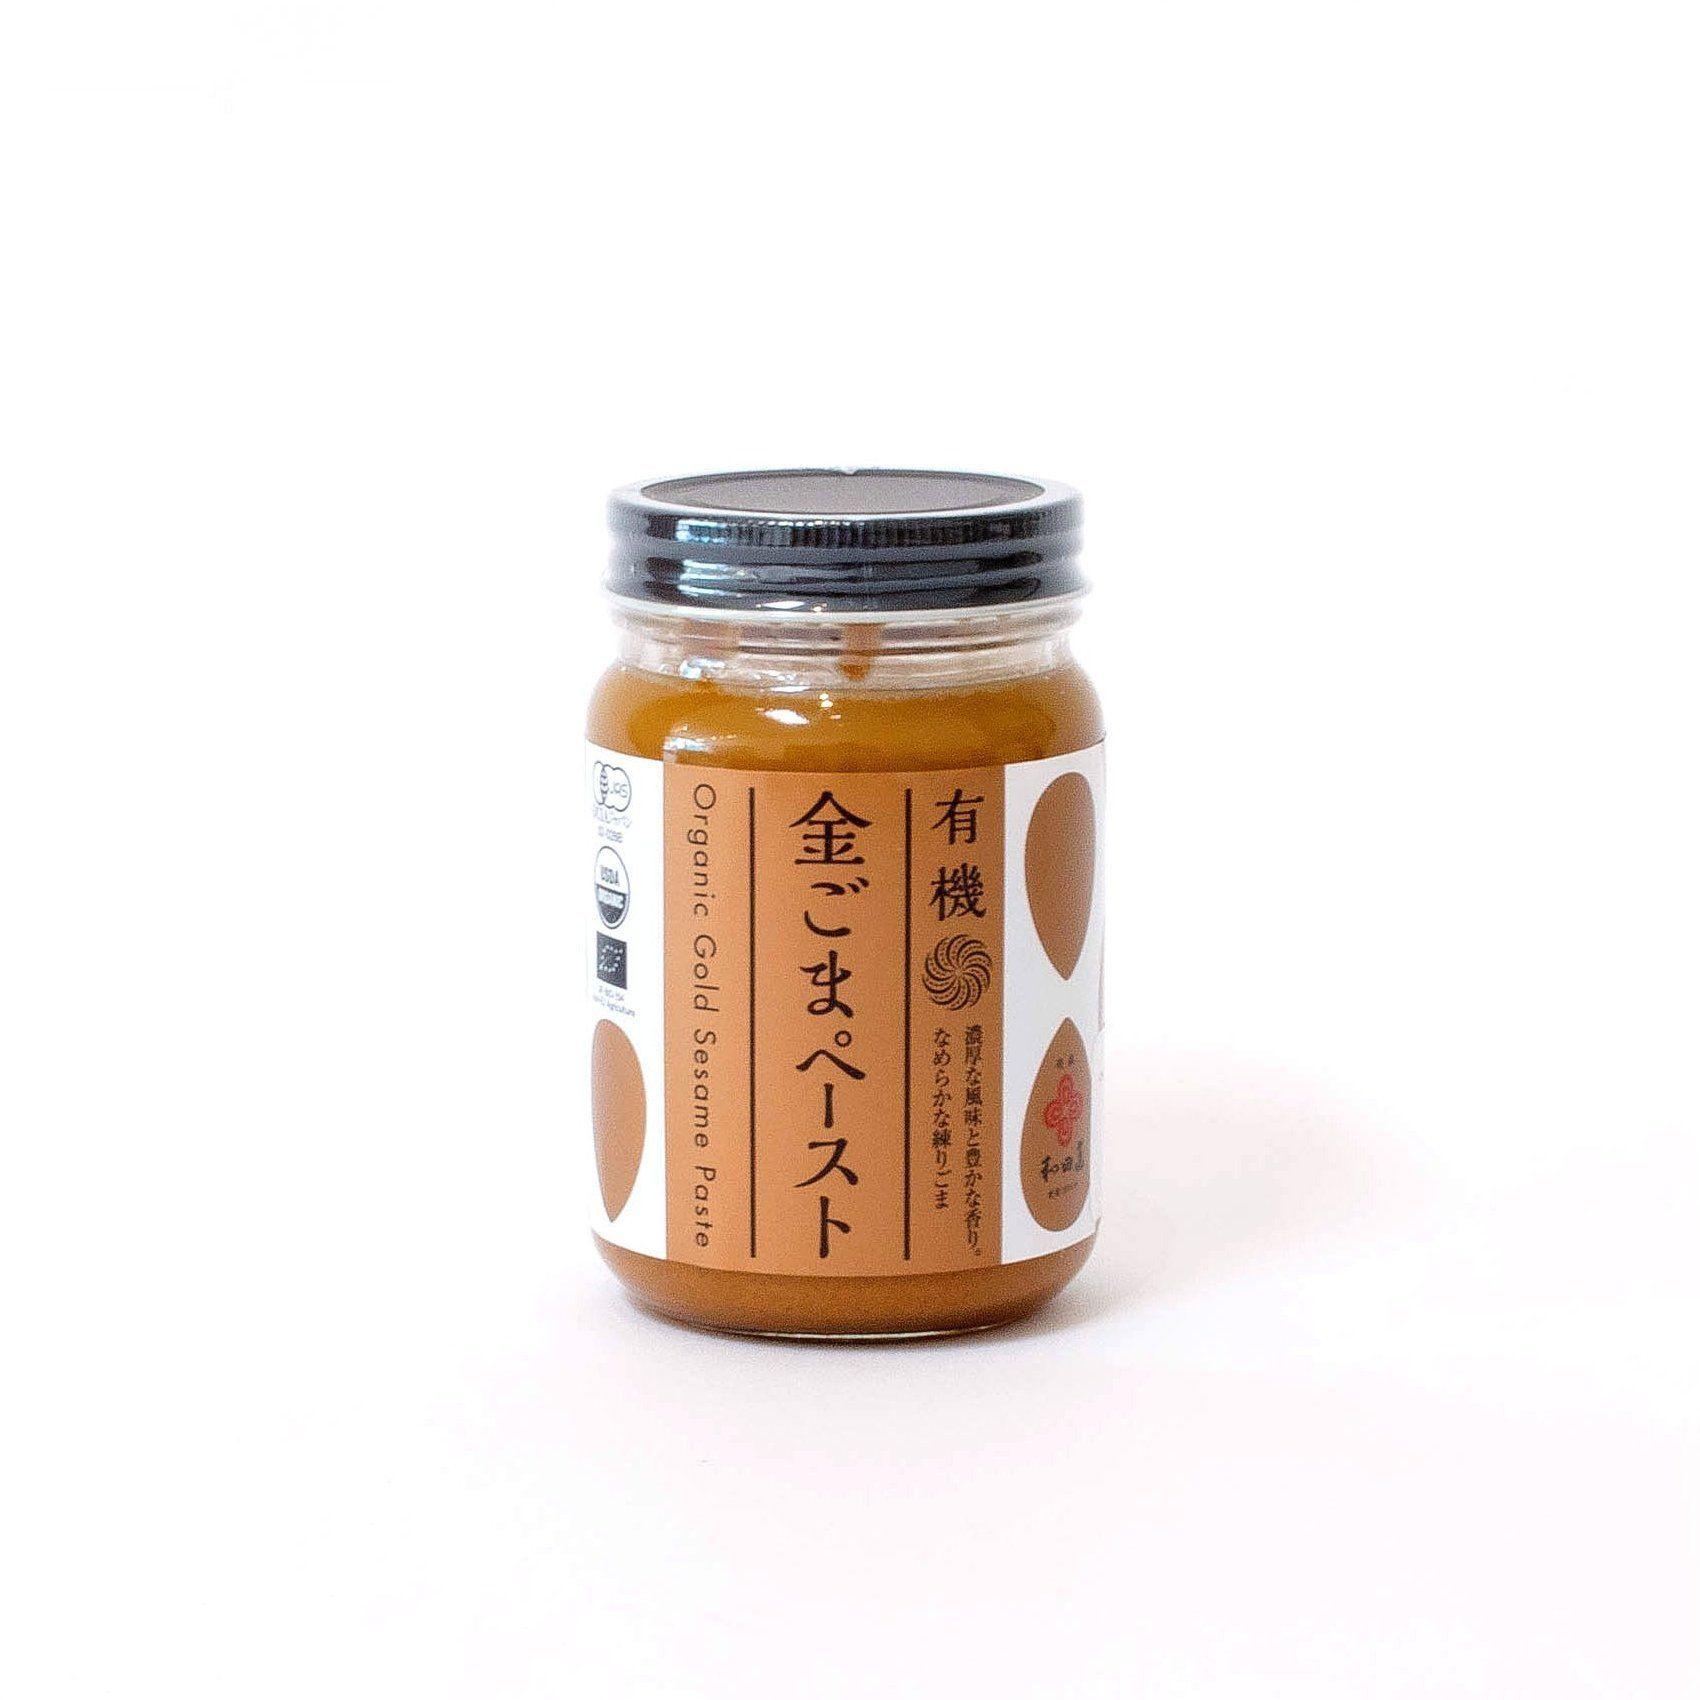 Organic Golden Sesame Paste by Wadaman Donabe, Things to